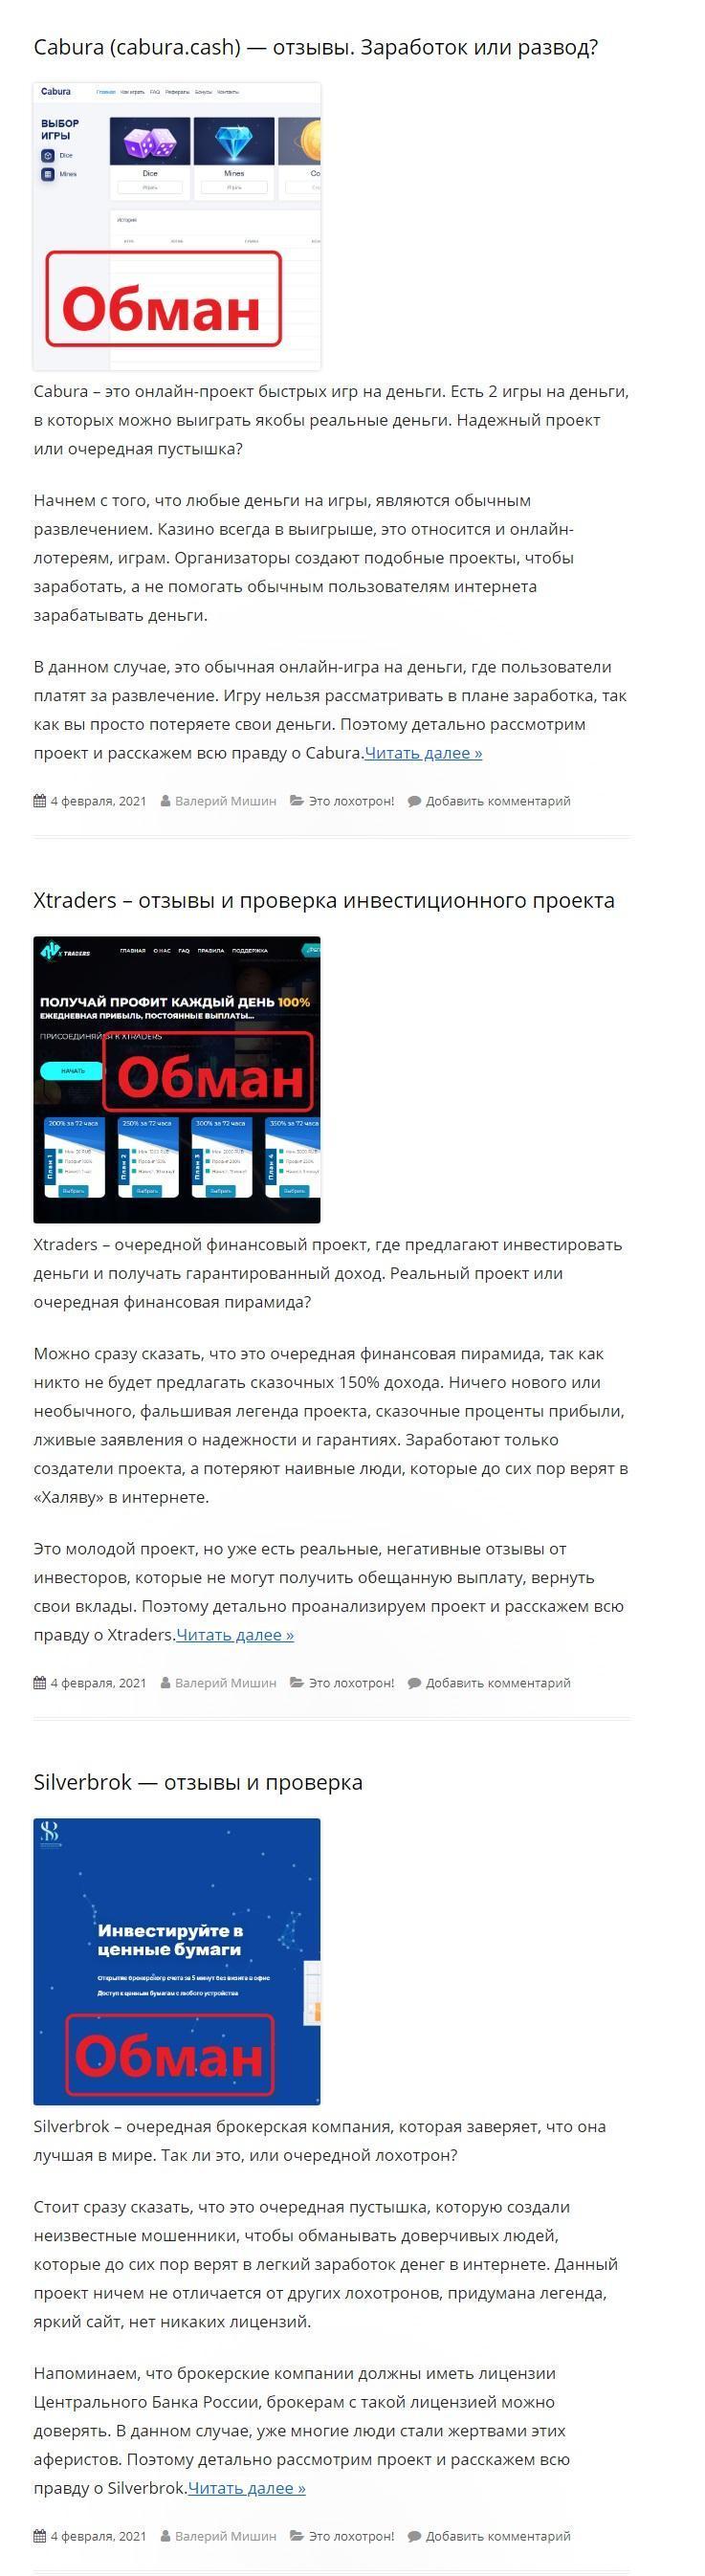 seoseed.ru разоблачает мошенников